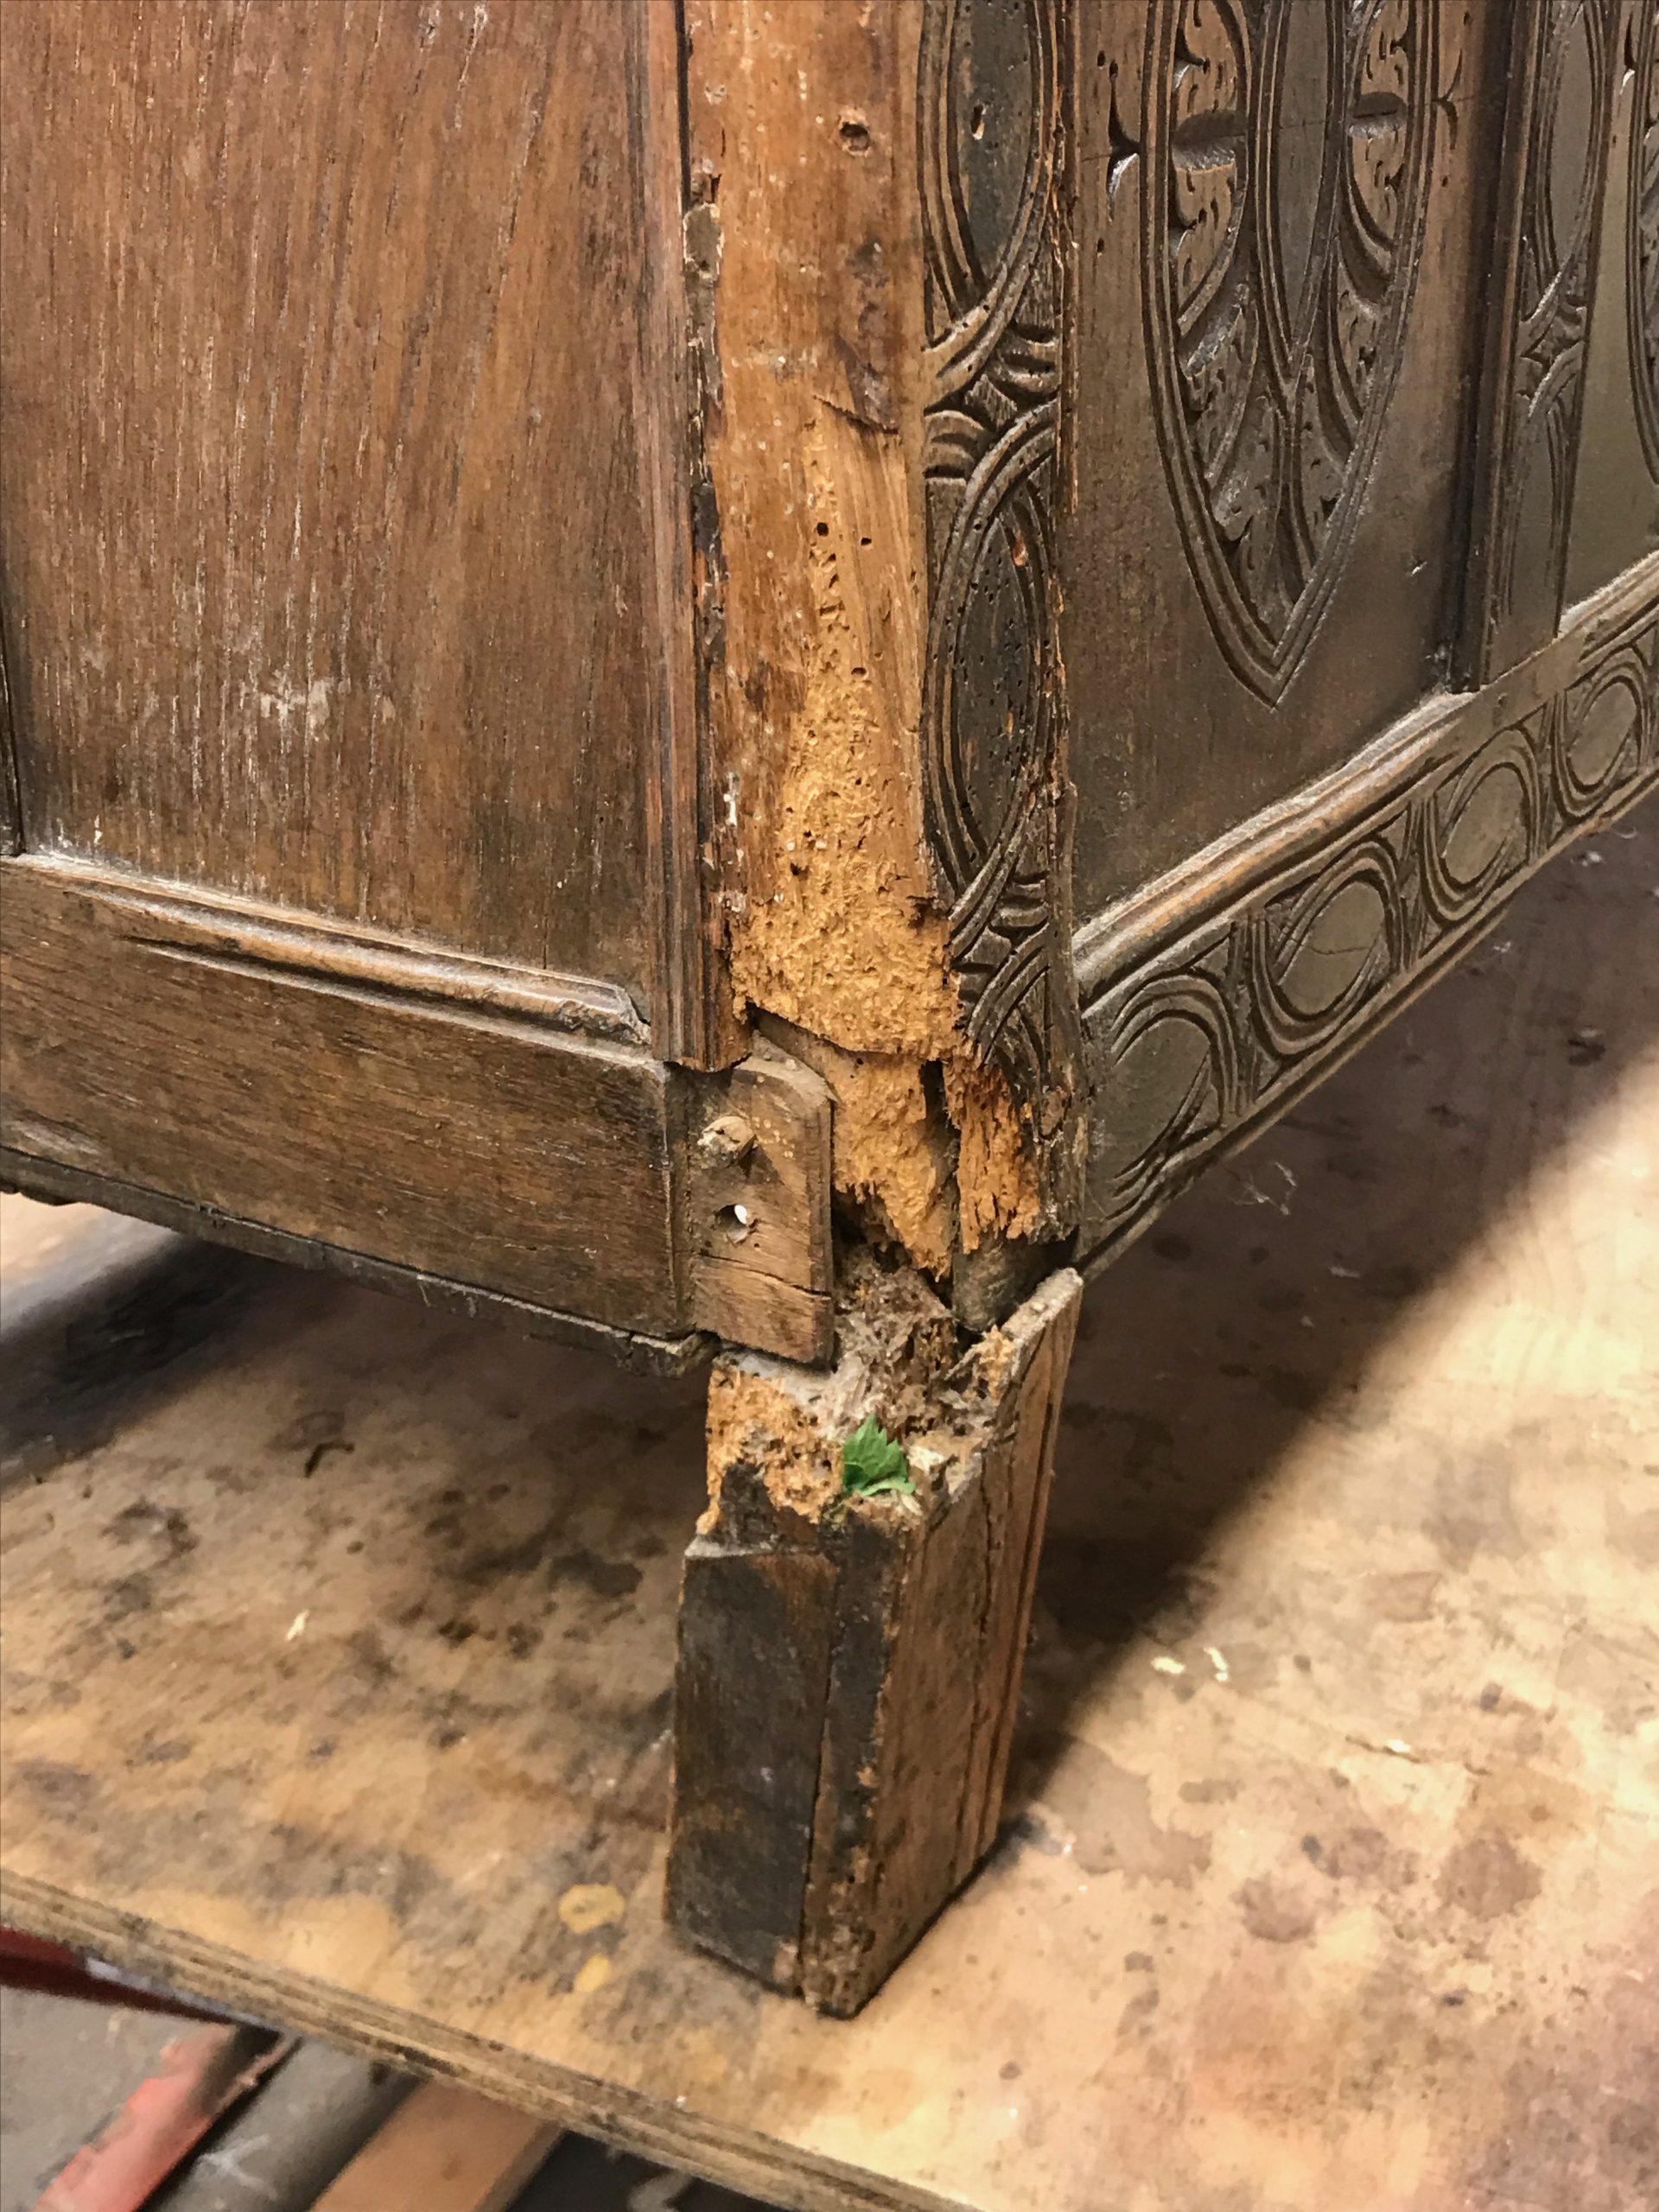 A badly damaged front leg.